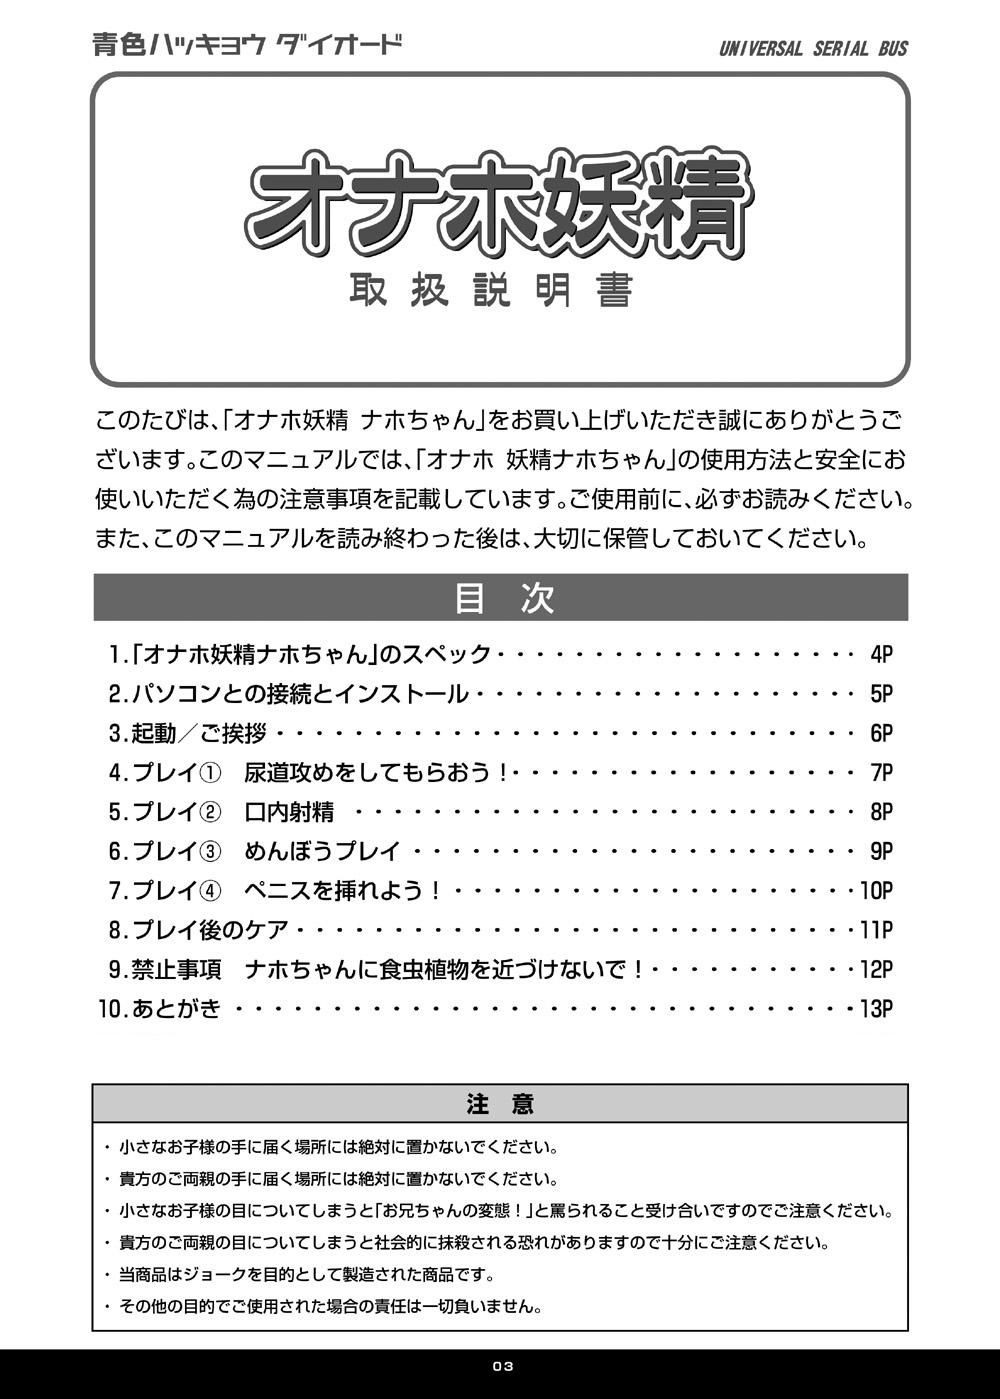 Onaho Yousei Toriatsukai Setsumei-sho 1